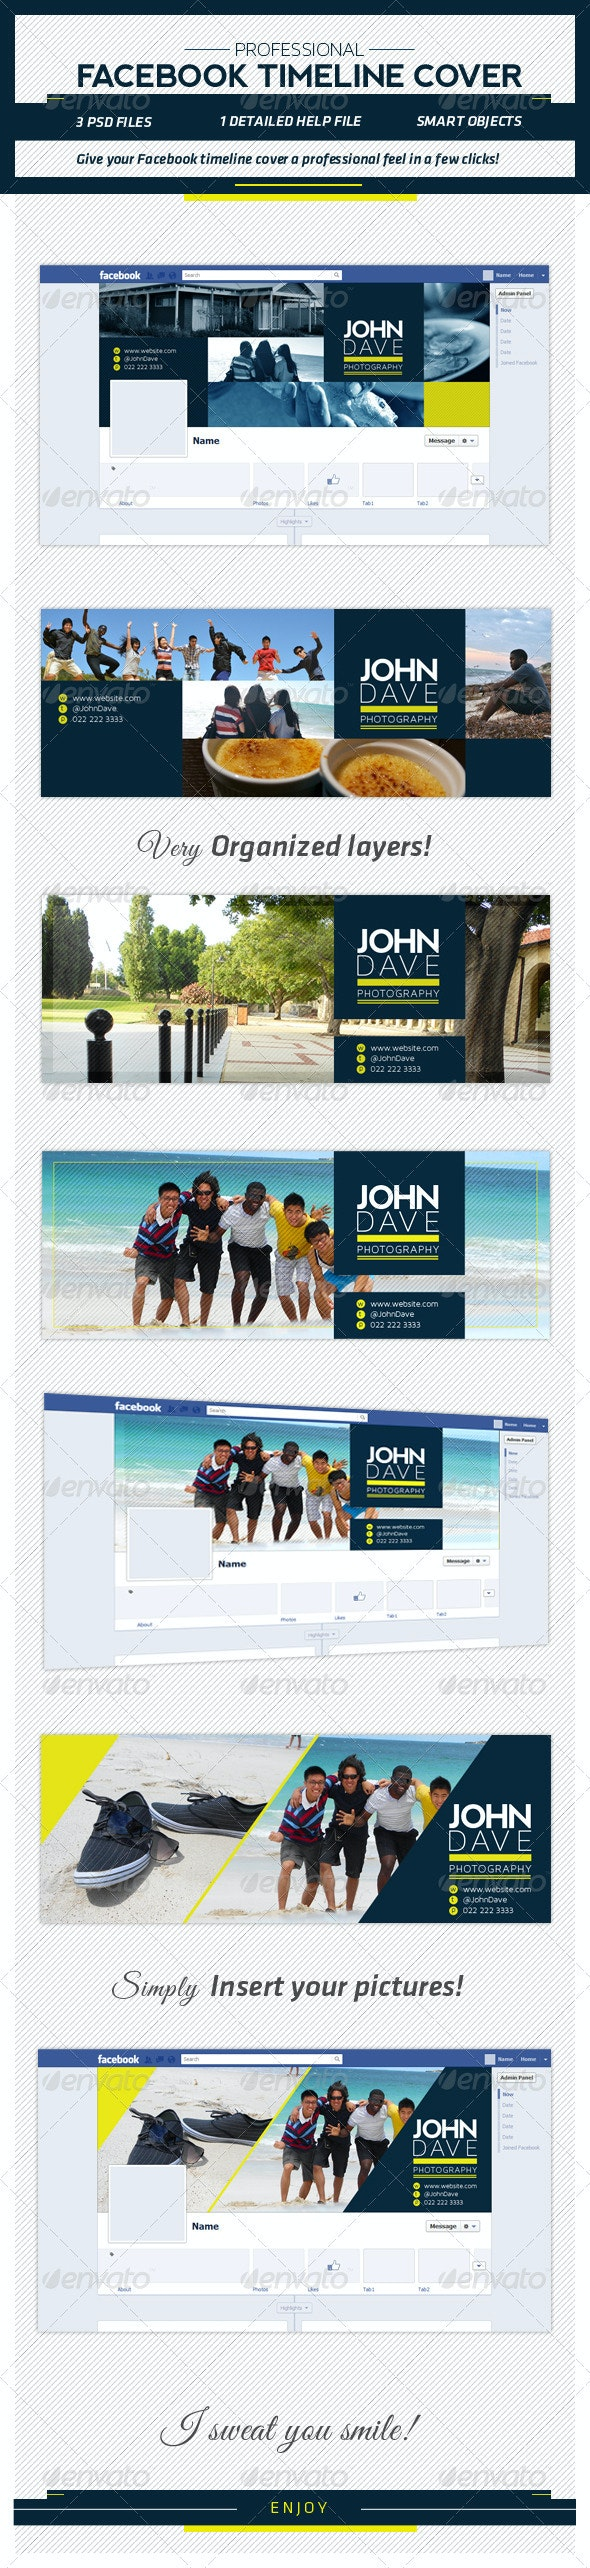 Professional FB Timeline Template - Facebook Timeline Covers Social Media